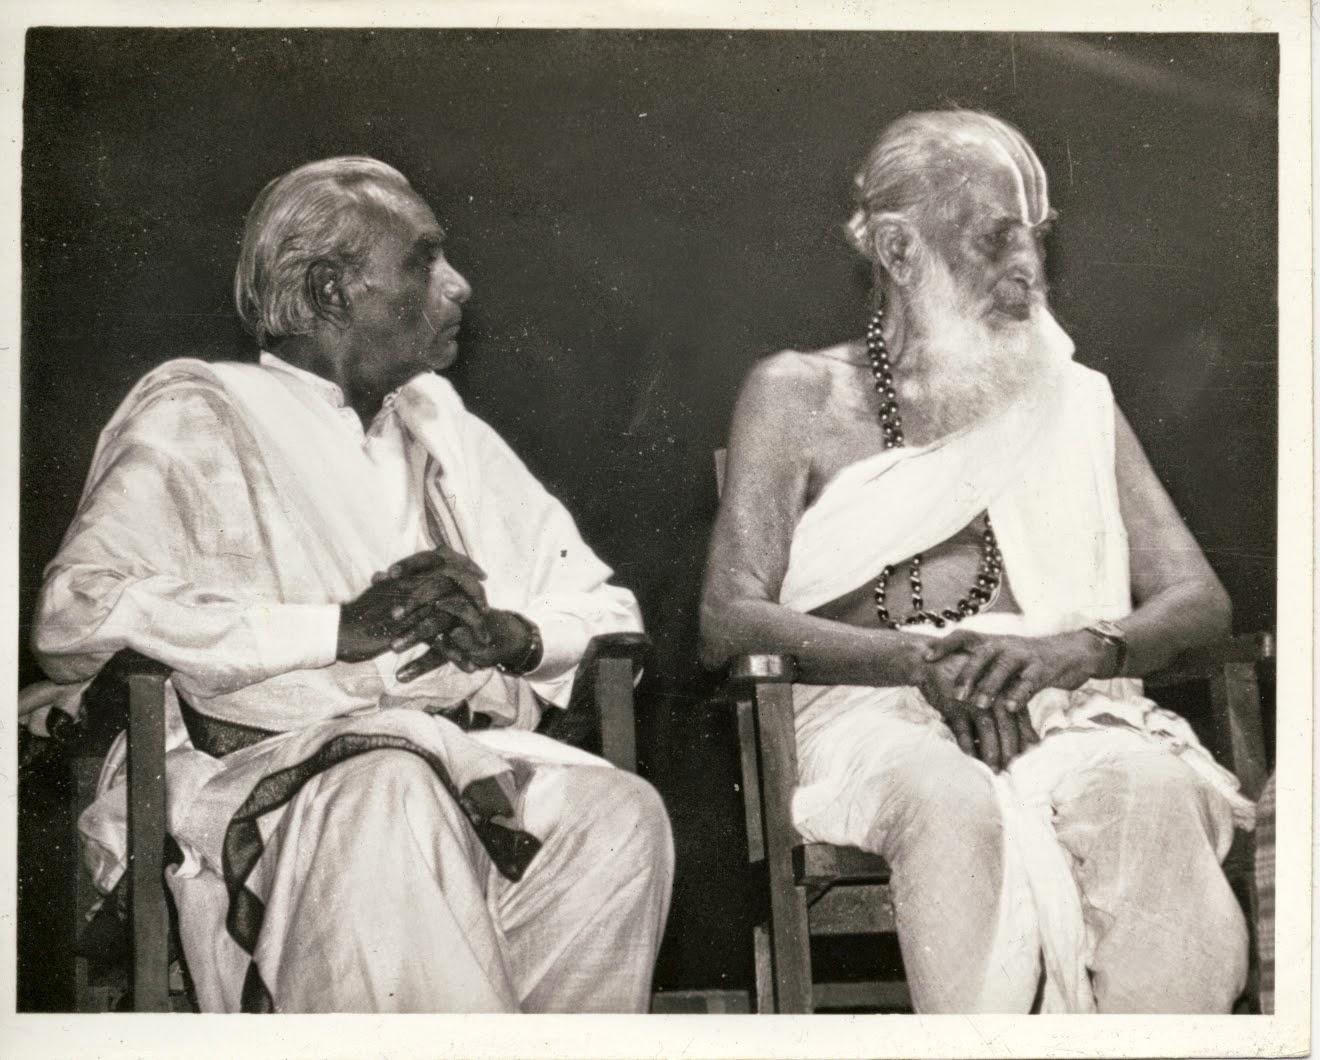 B.K.S. Iyengar y Krishnamacharya